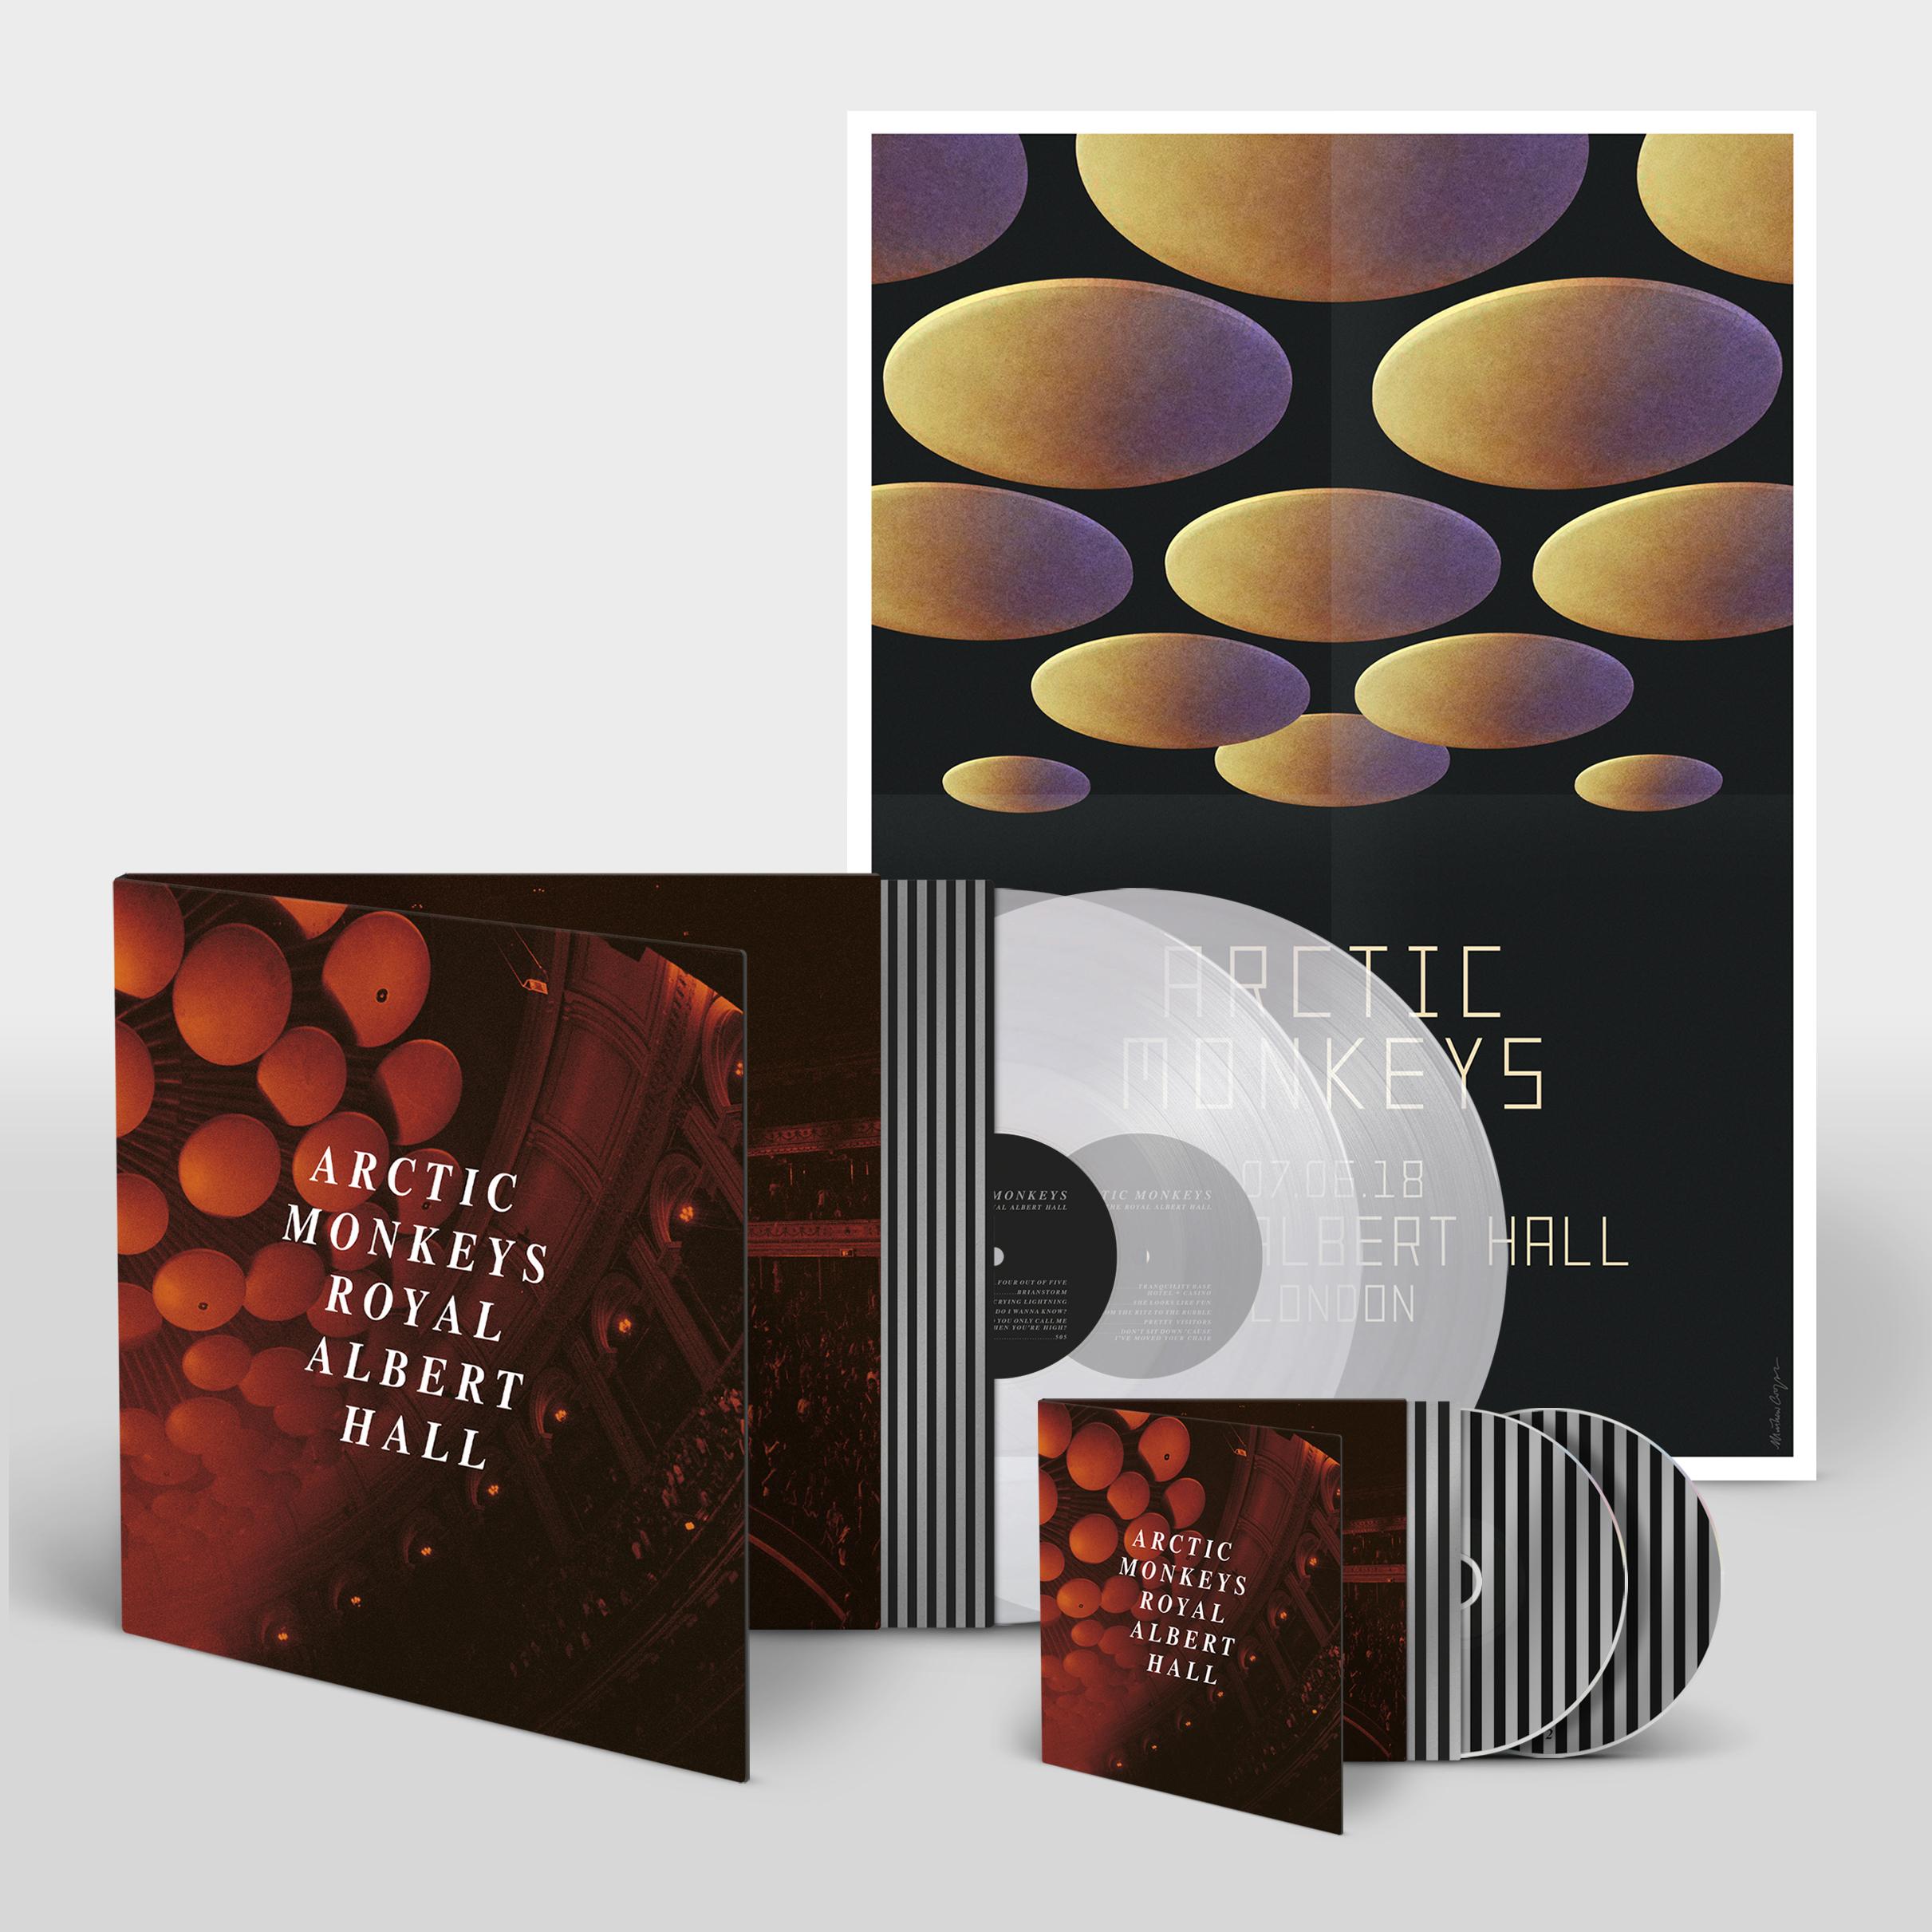 Buy Online Arctic Monkeys - Ltd Double LP / CD Bundle<br>Heavyweight Clear Vinyl<br>20 Tracks<br>Gatefold Sleeve<br>Exclusive A2 Poster